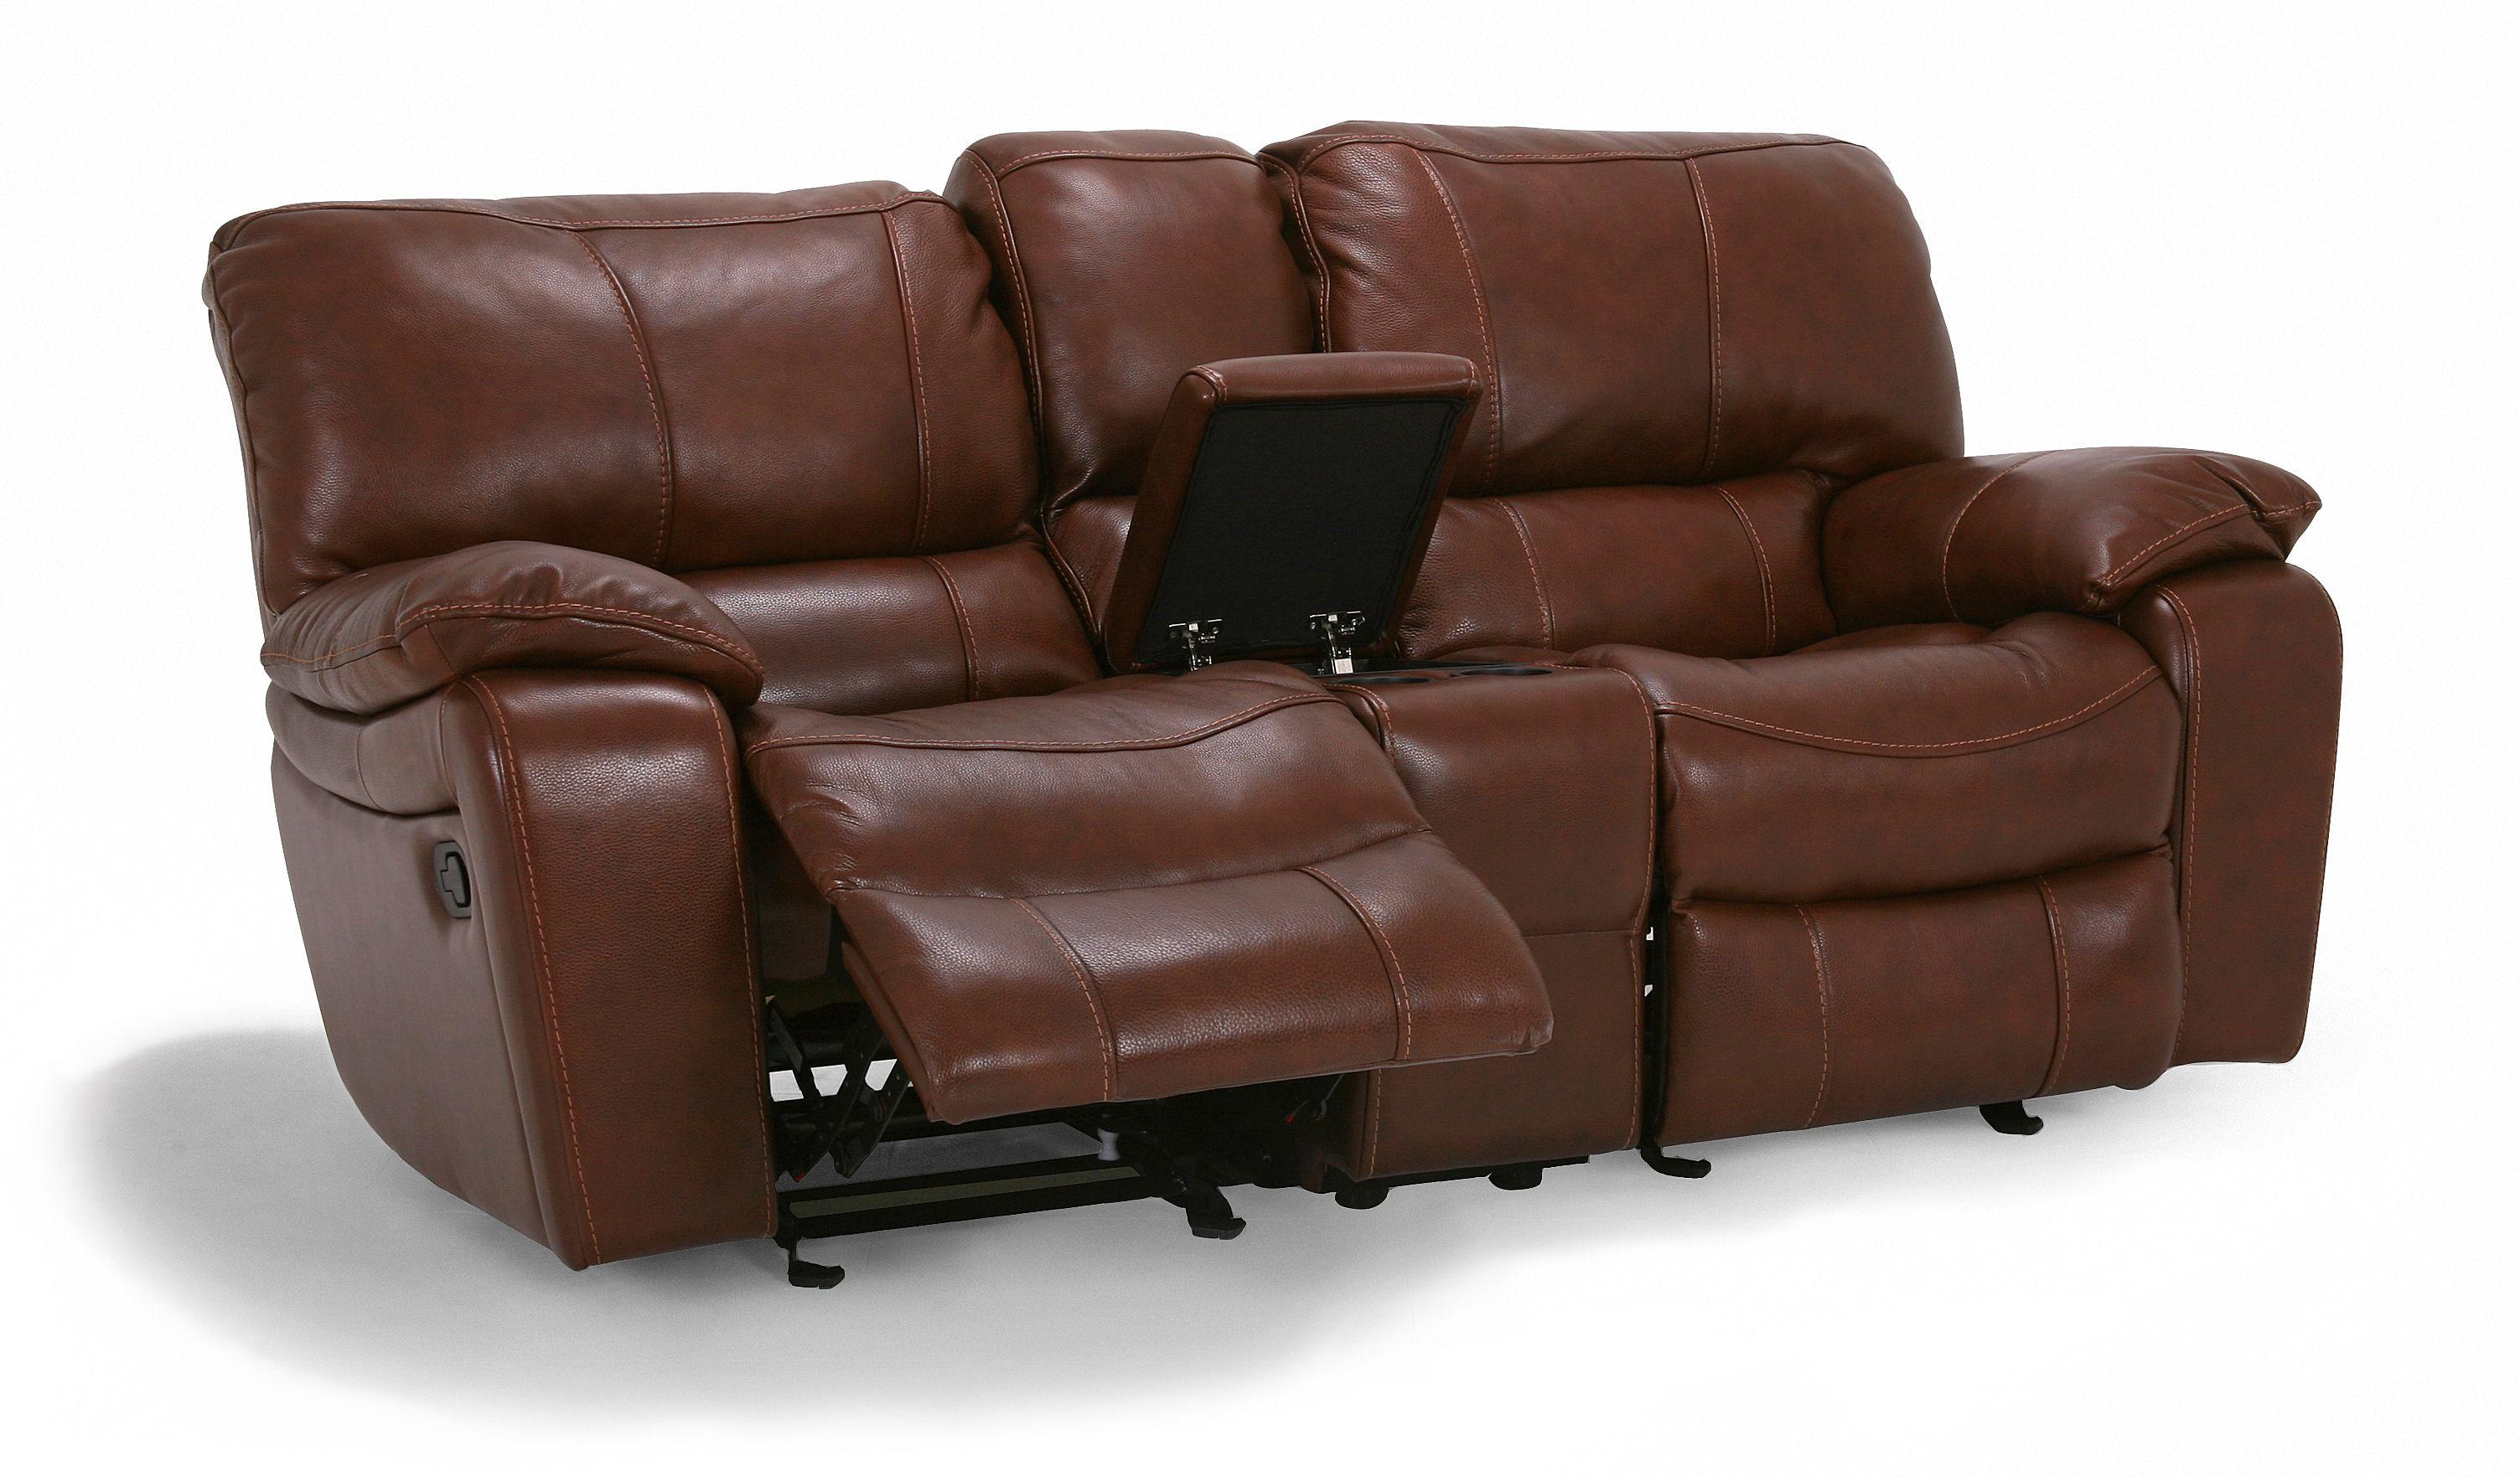 Flexsteel Latitudes - Grandview Double Reclining Love Seat - Item Number: 1241-604